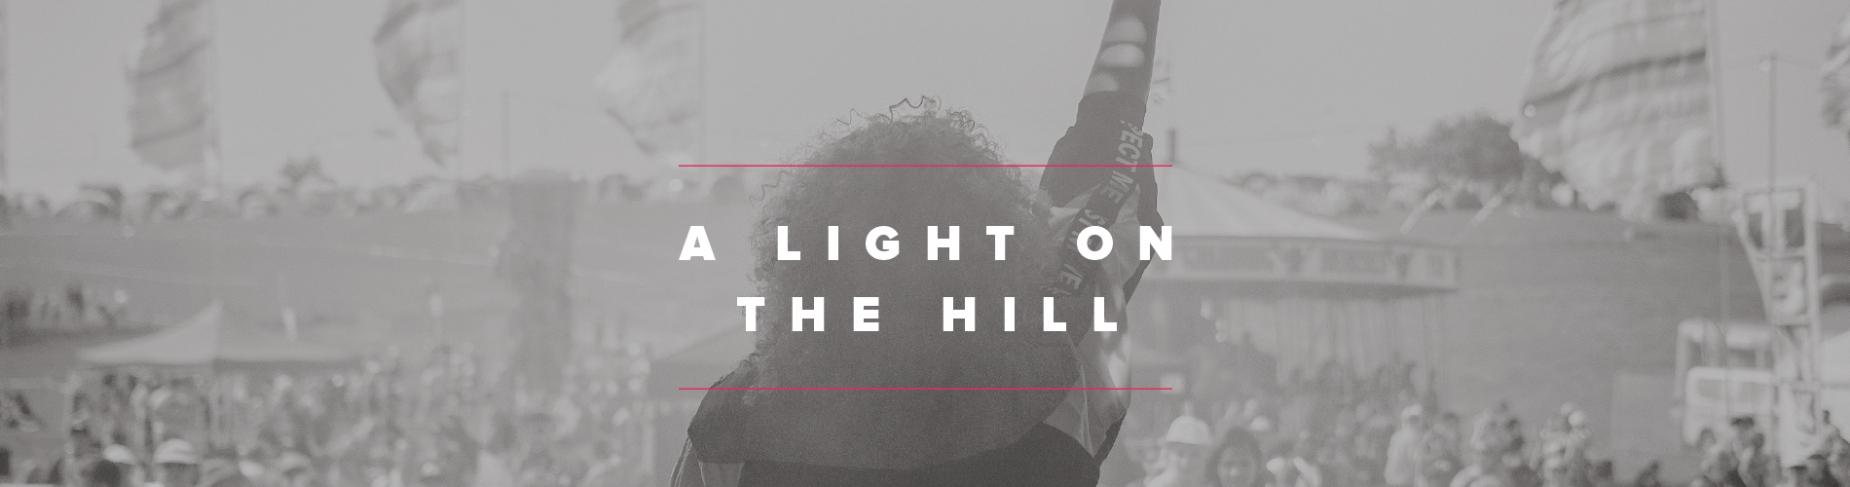 A light on a hill